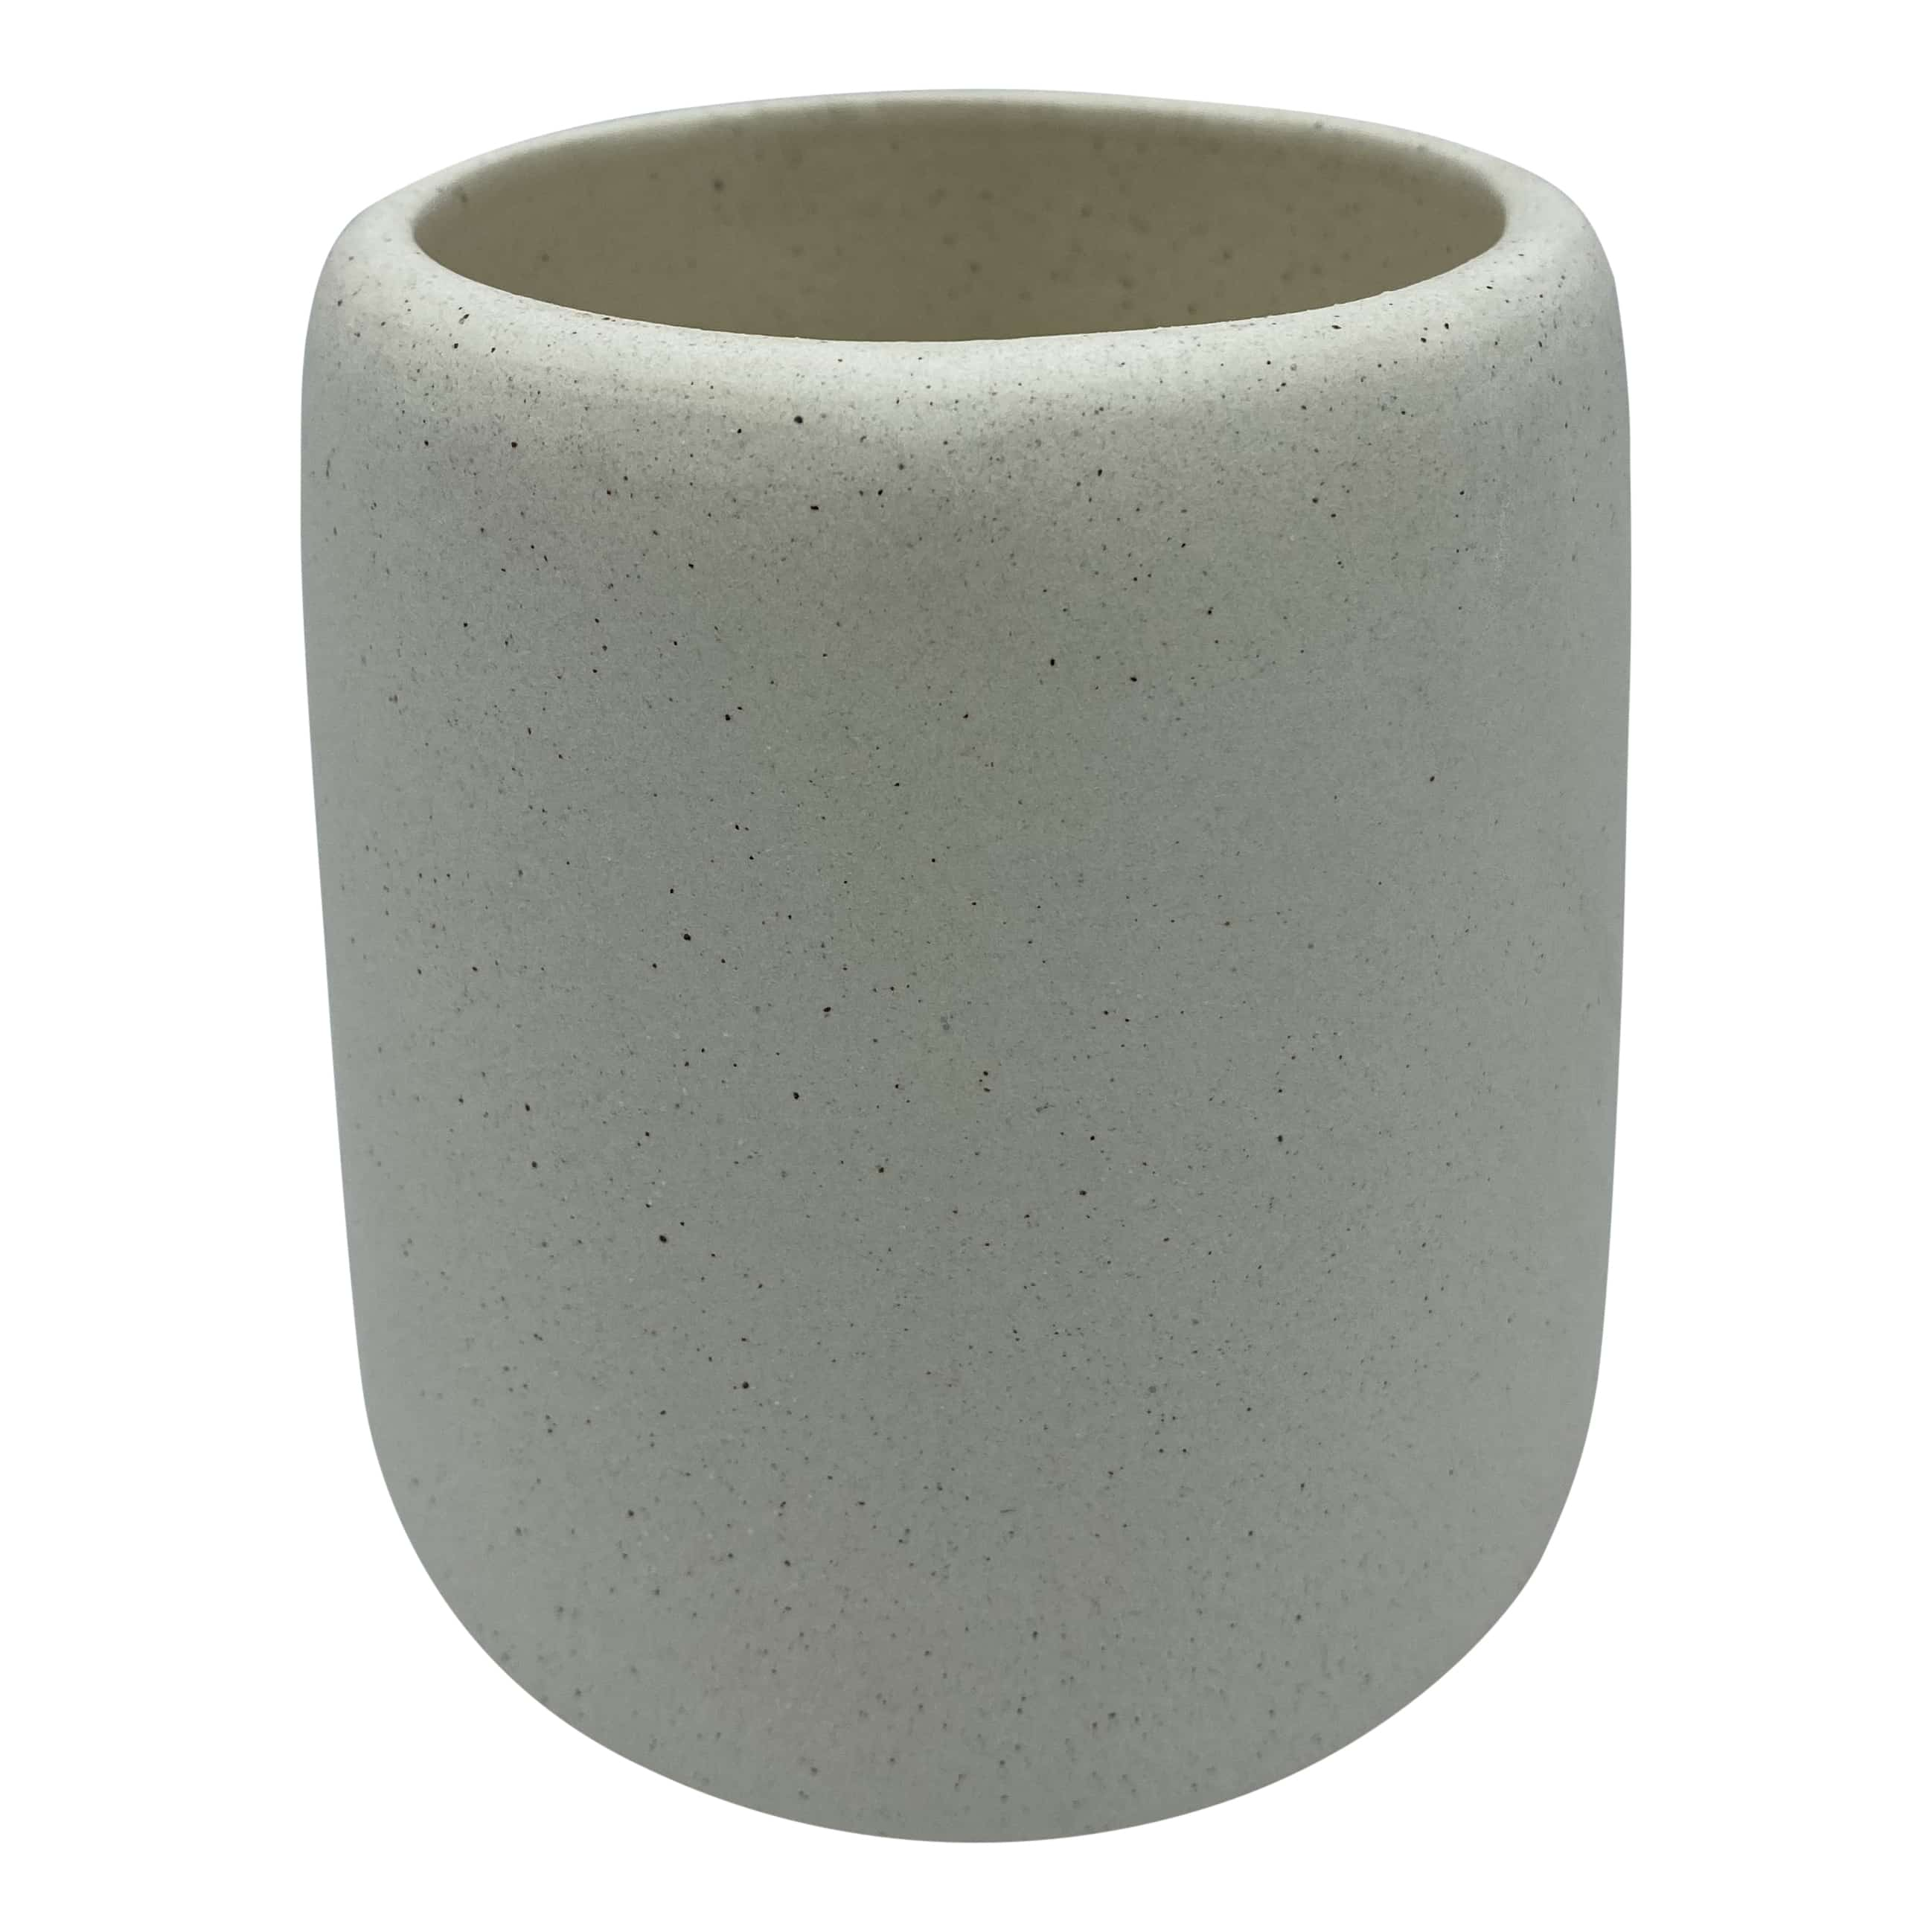 4goodz toiletborstel keramiek mat naturel met zwarte spikkels